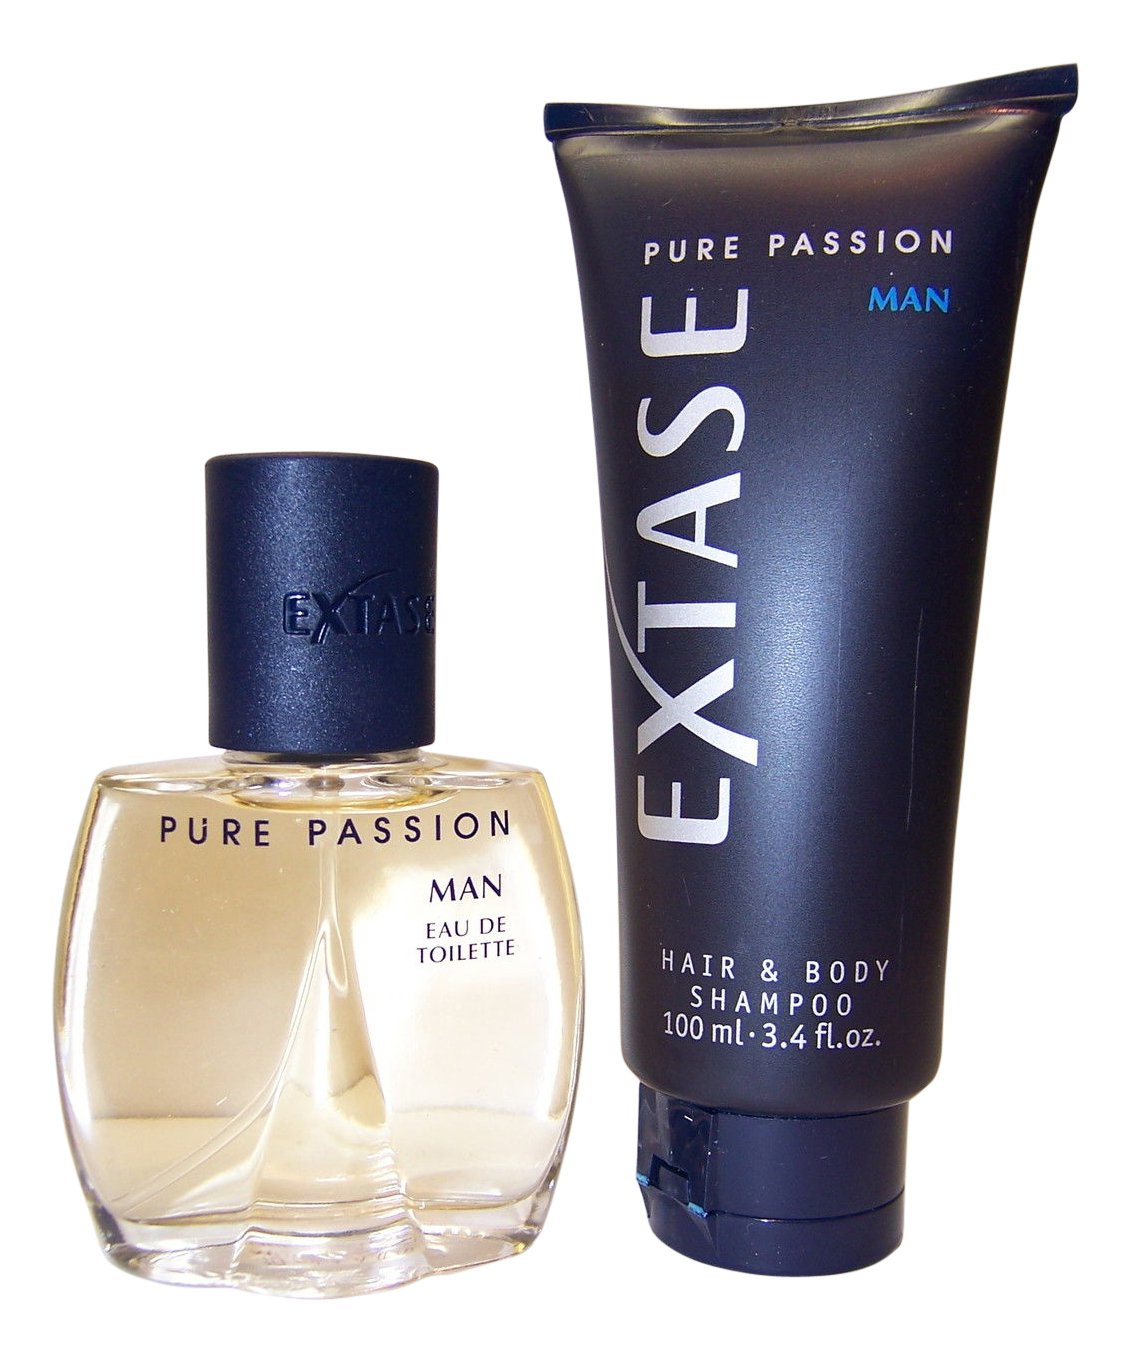 Mülhens - Extase Pure Passion Man | Reviews and Rating